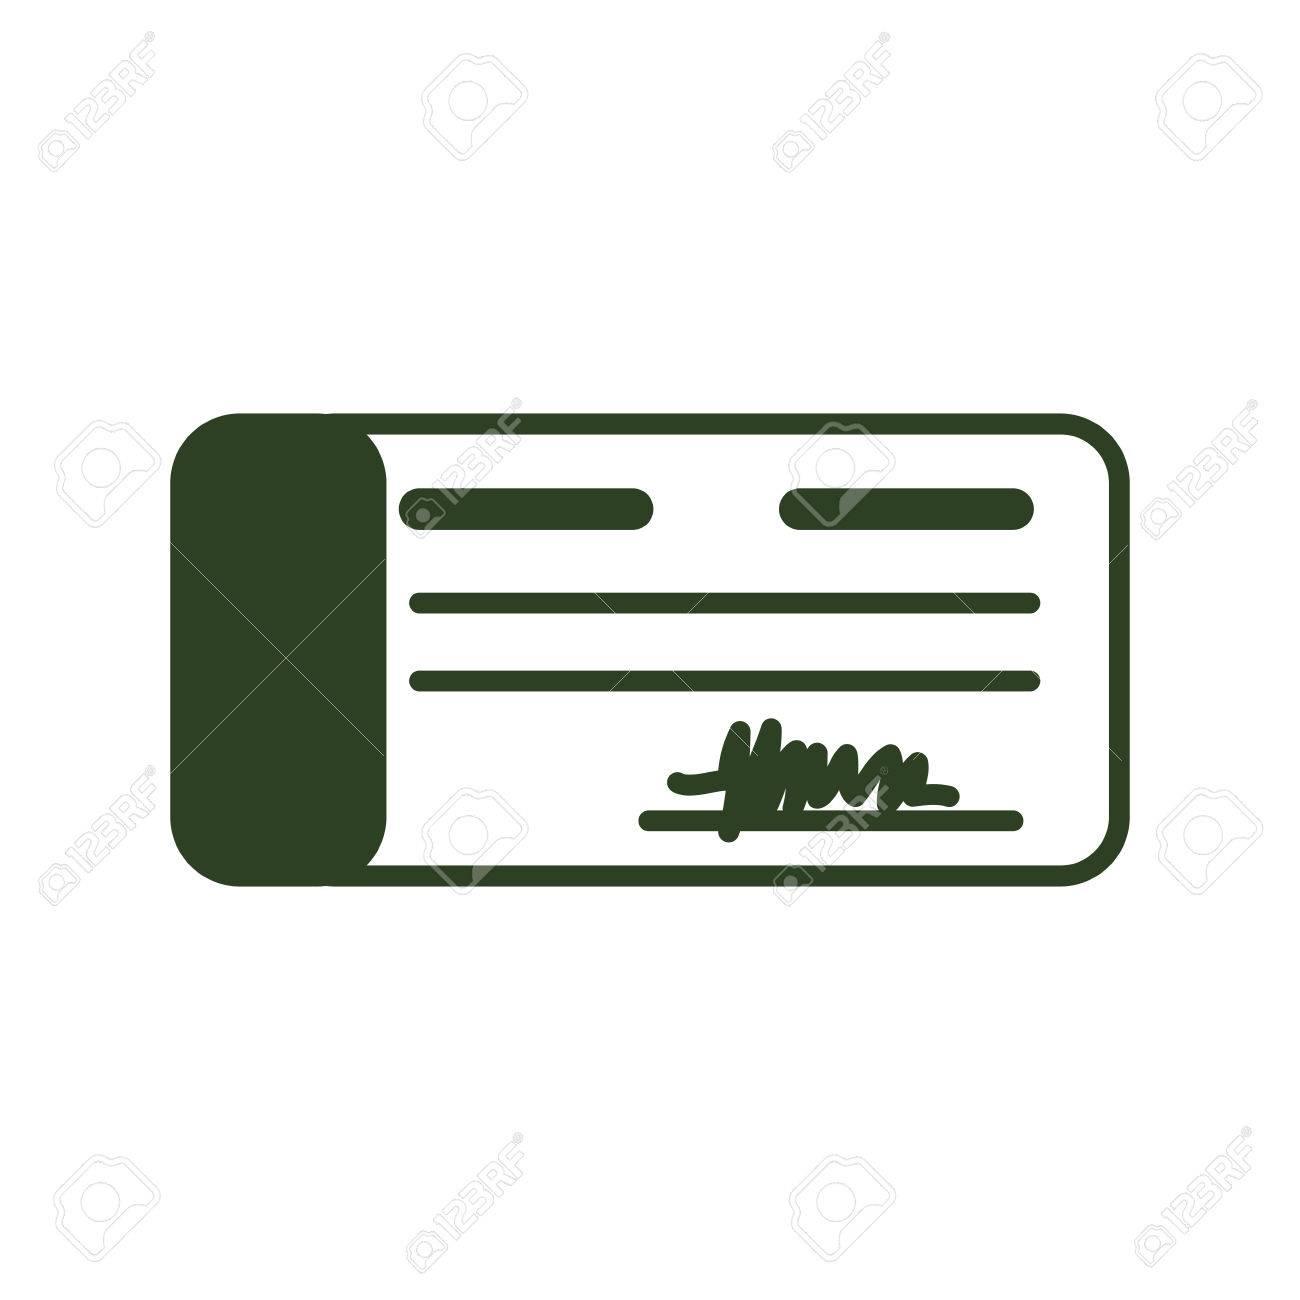 Bank Check Money Icon Vector Illustration Graphic Design Royalty